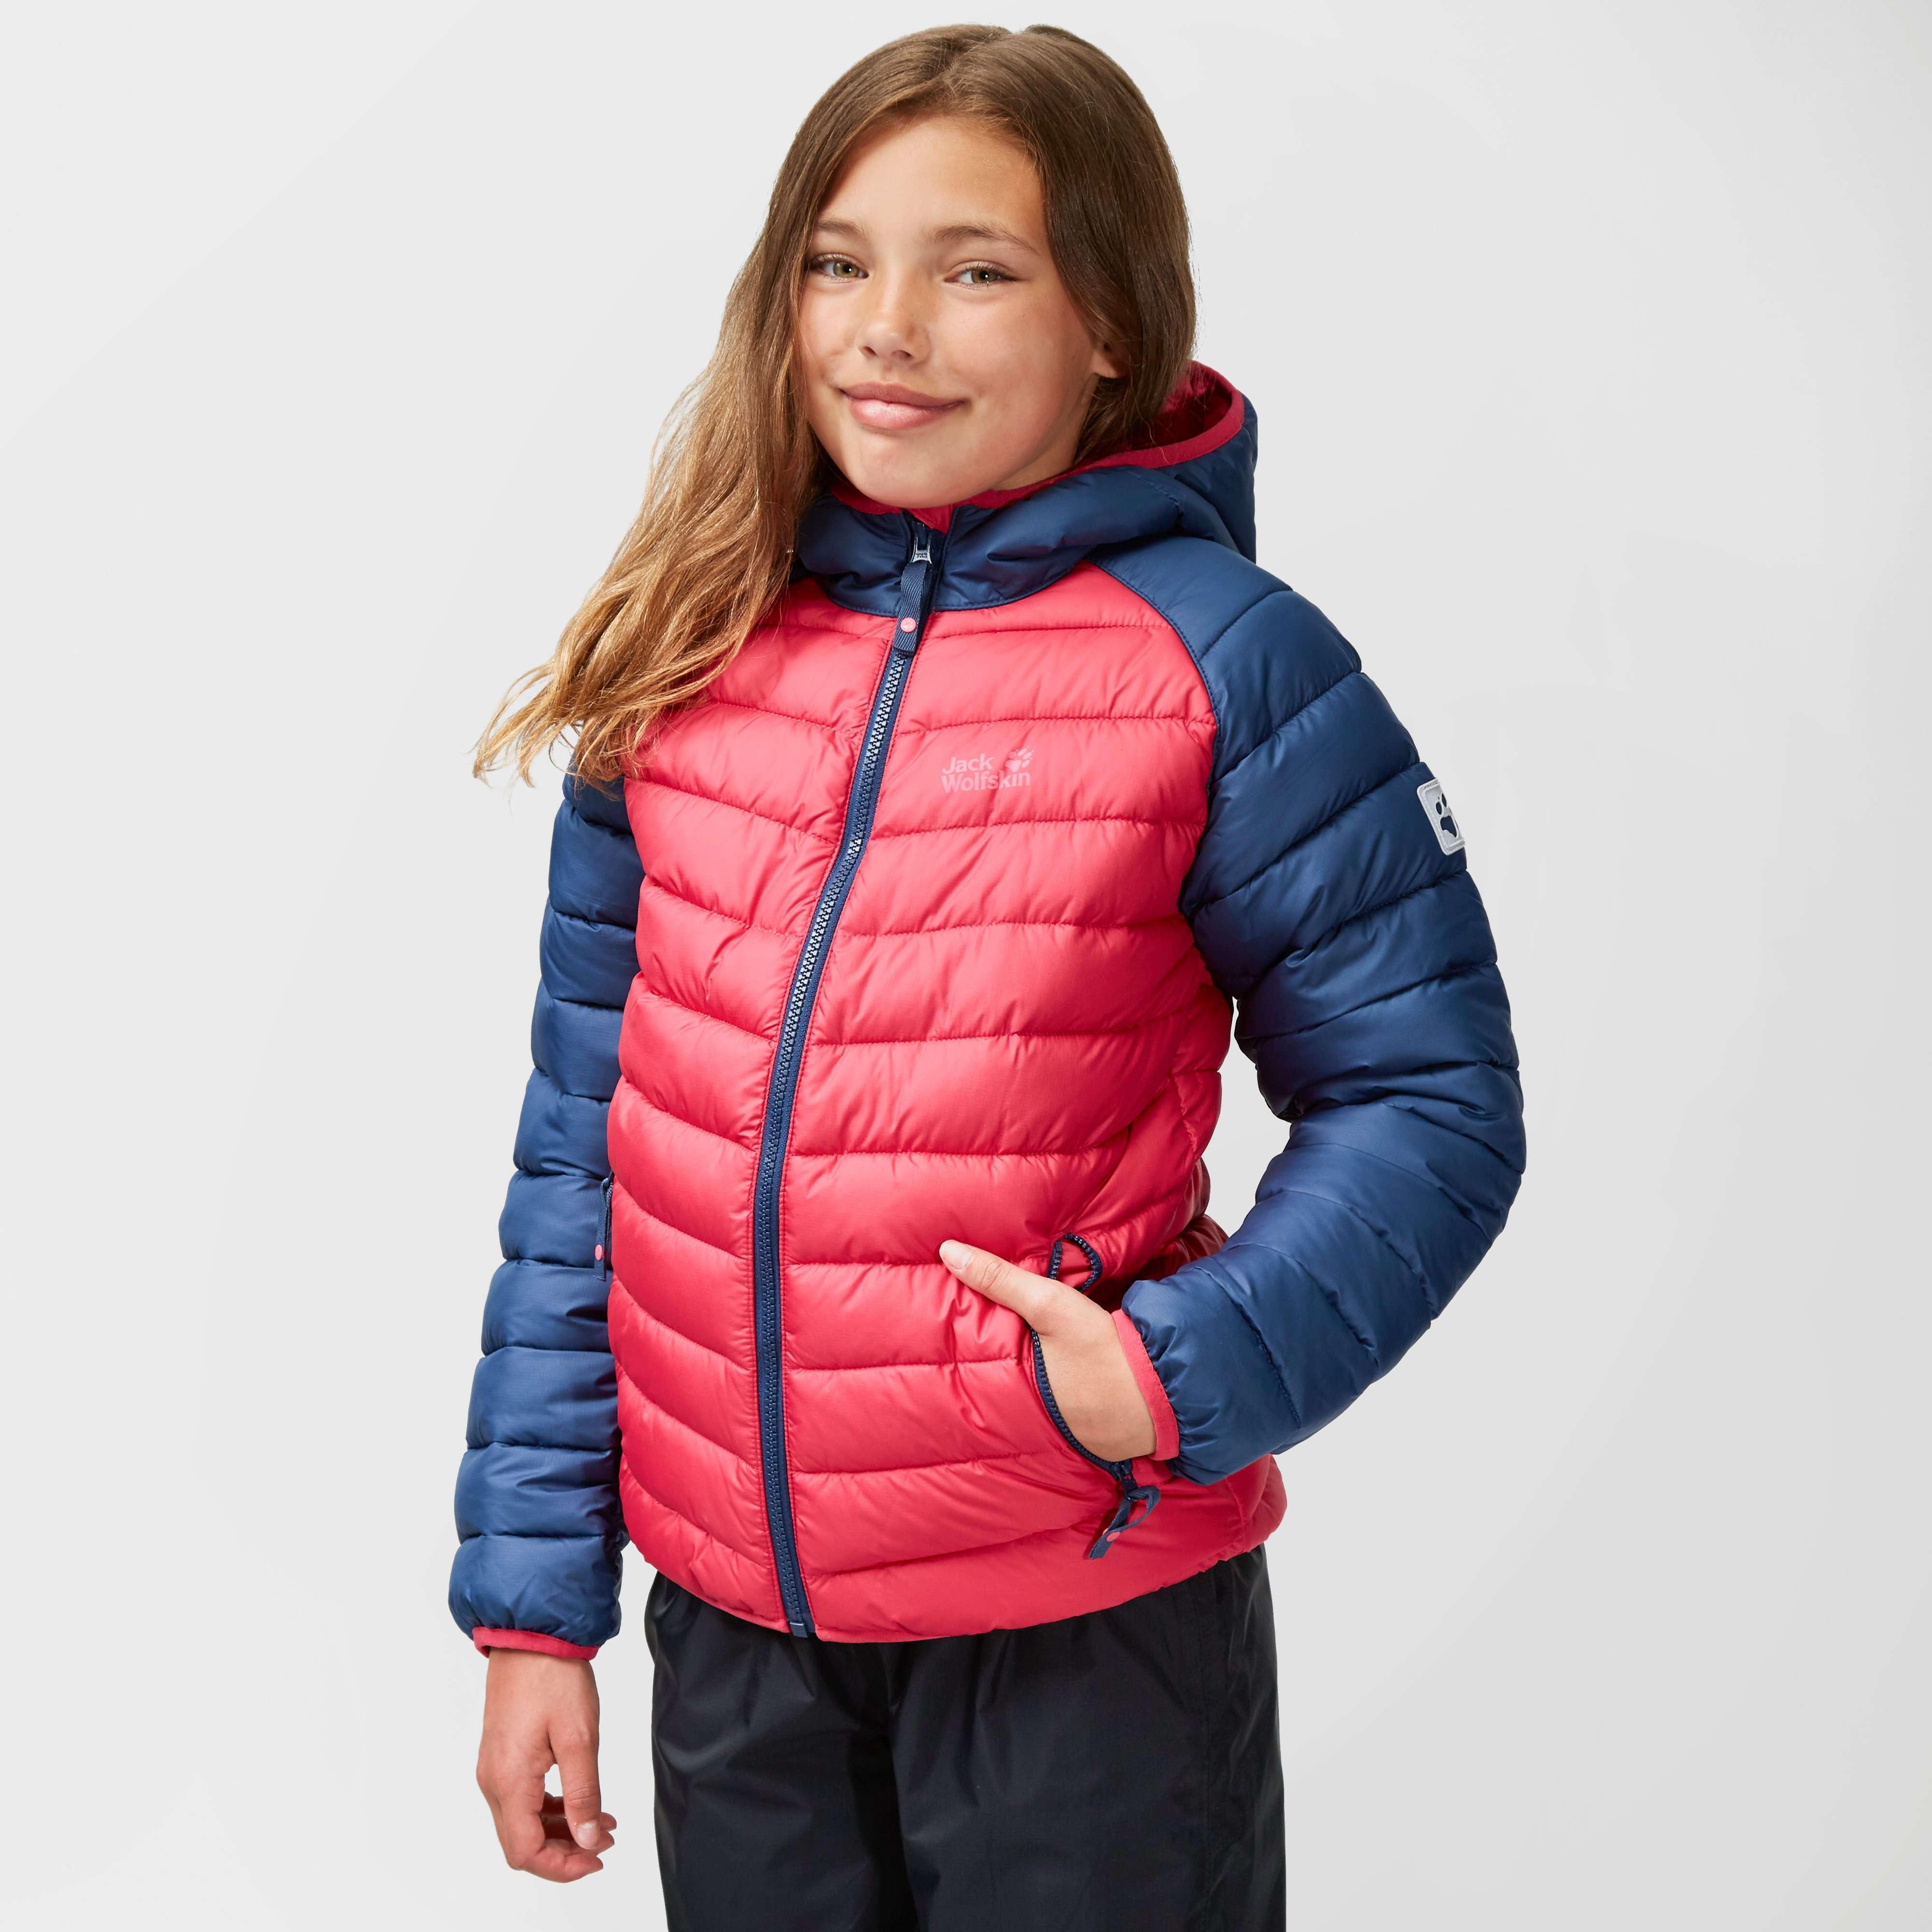 JACK WOLFSKIN Girl's Zenon Insulated Jacket